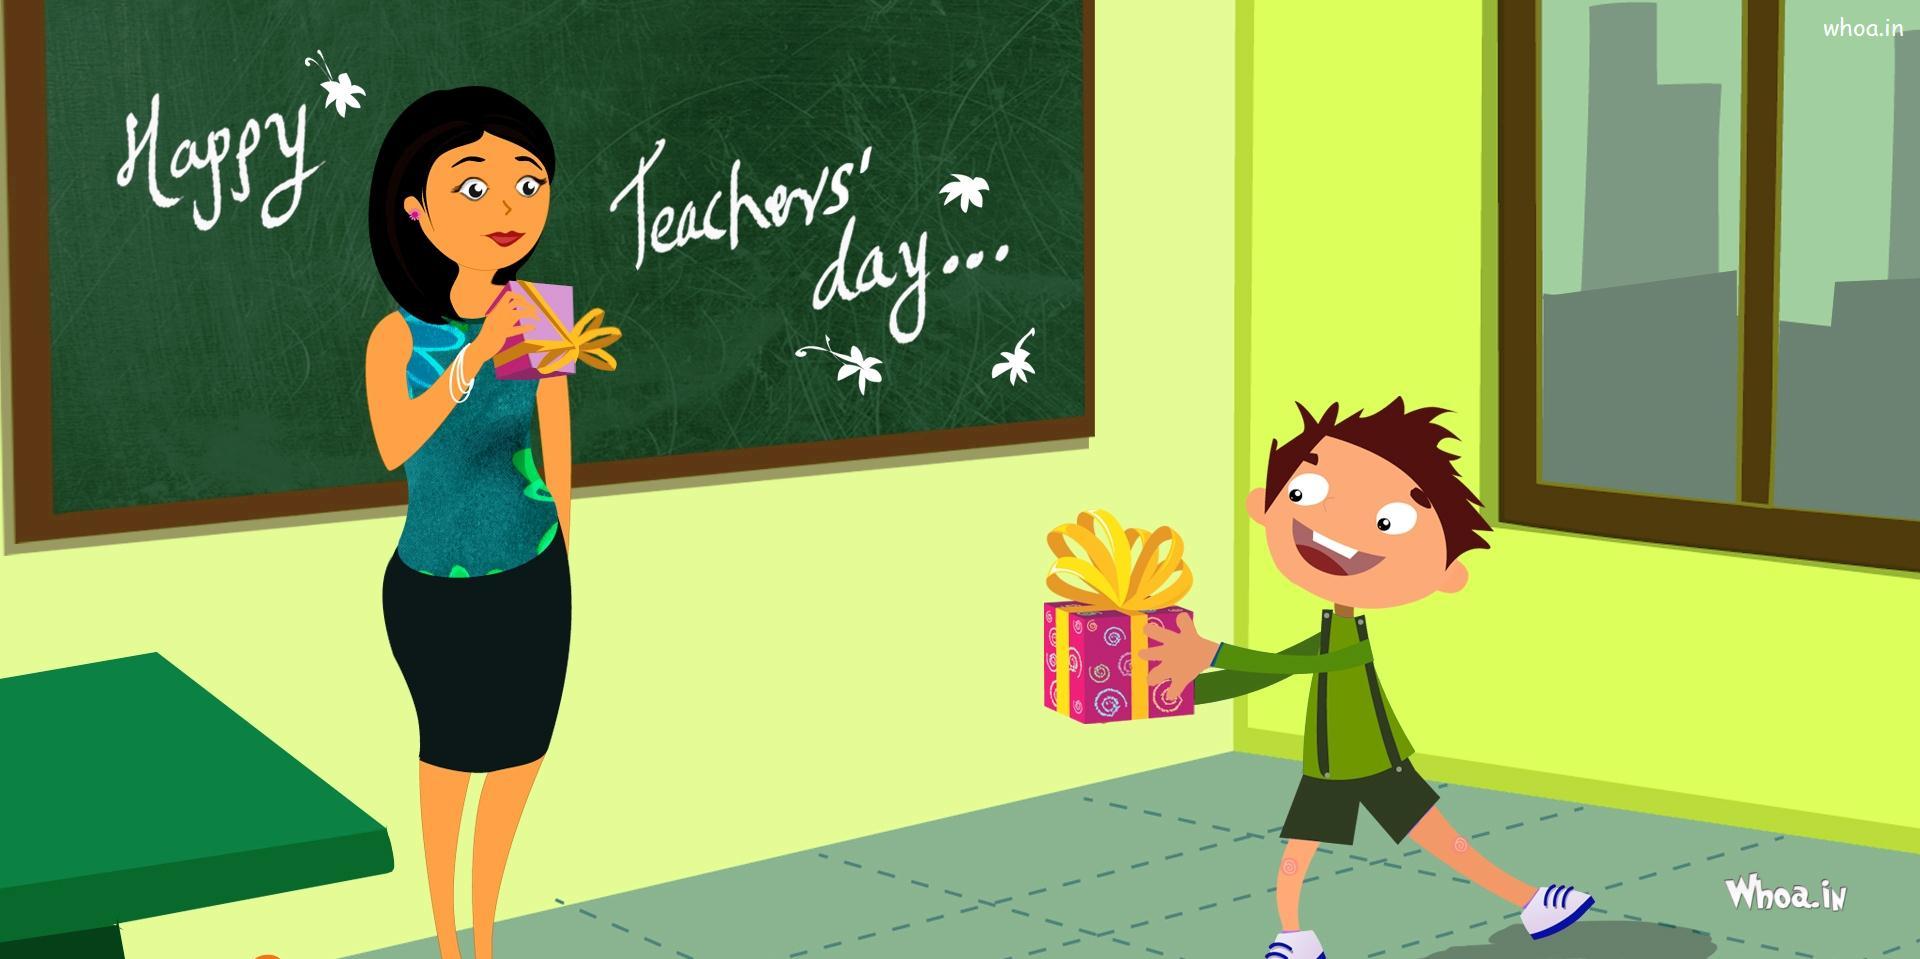 Happy Teachers Day 2019 Hd Greetings